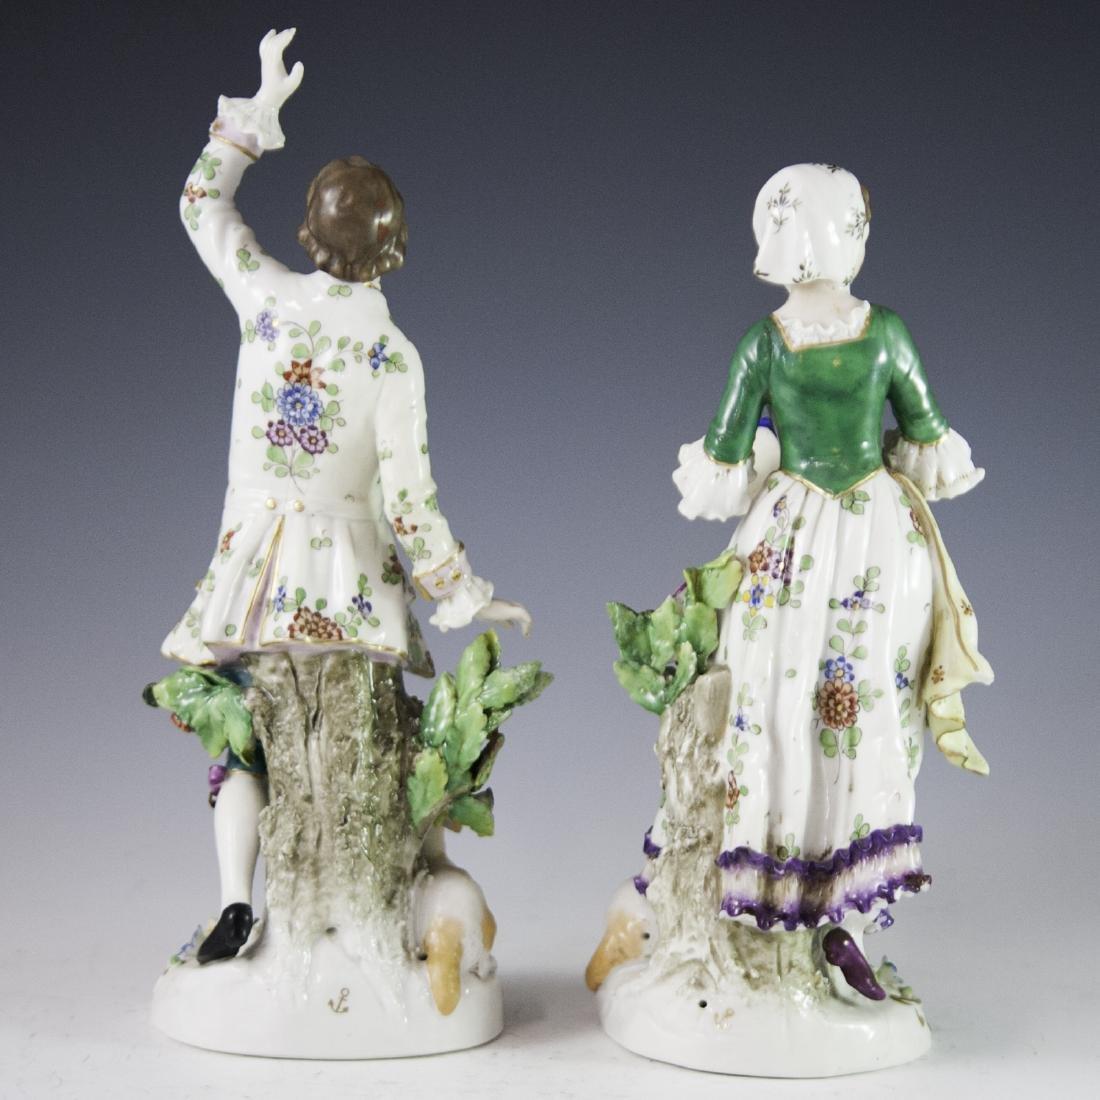 Chelsea Style Porcelain Figurines - 4